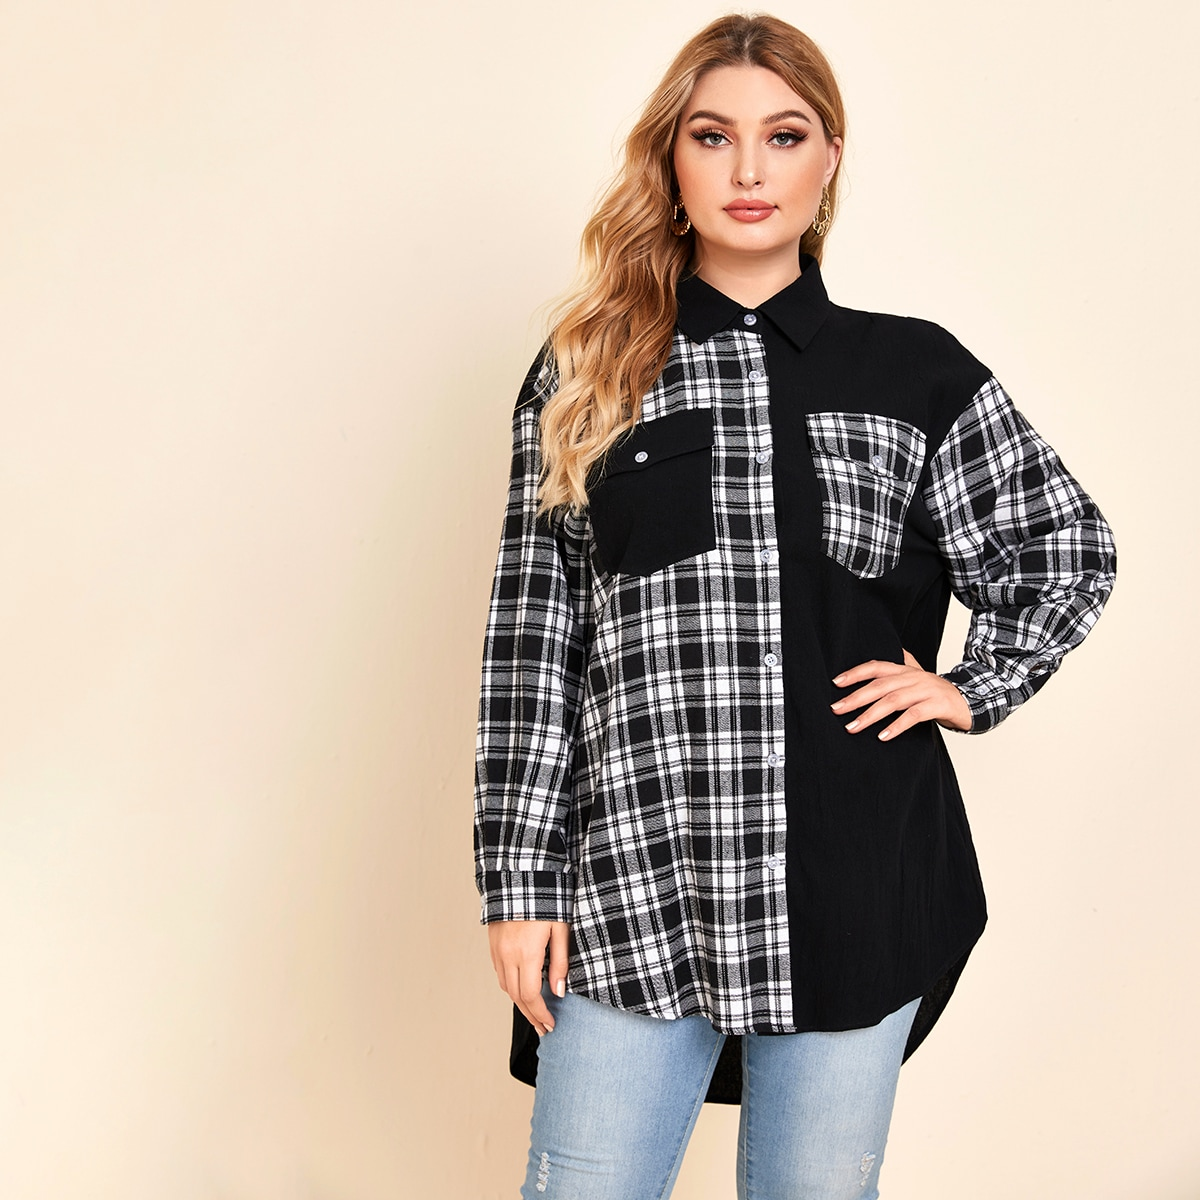 Асимметричная блузка размера плюс с карманом